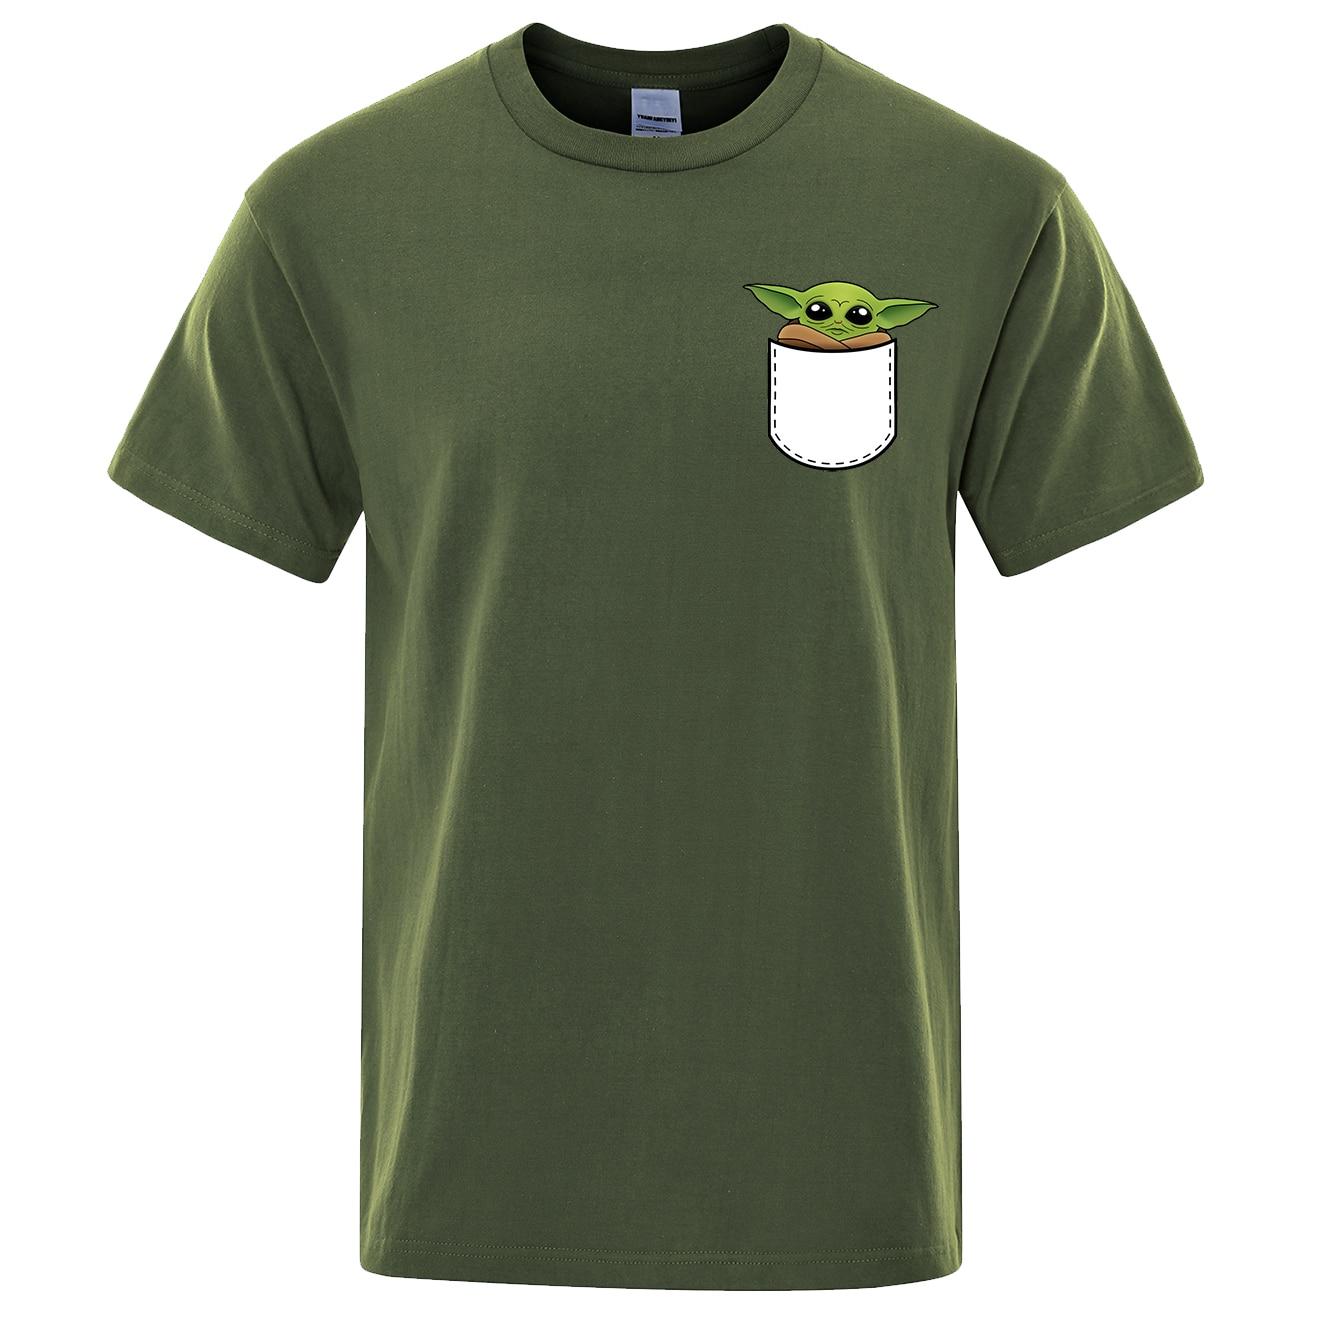 Baby Yoda Tshirt Men 2020 Summer New Cotton Short Sleeve Hip Hop T-shirt Cartoon Cute Yoda T shirt Movies Men Black Tees Tops